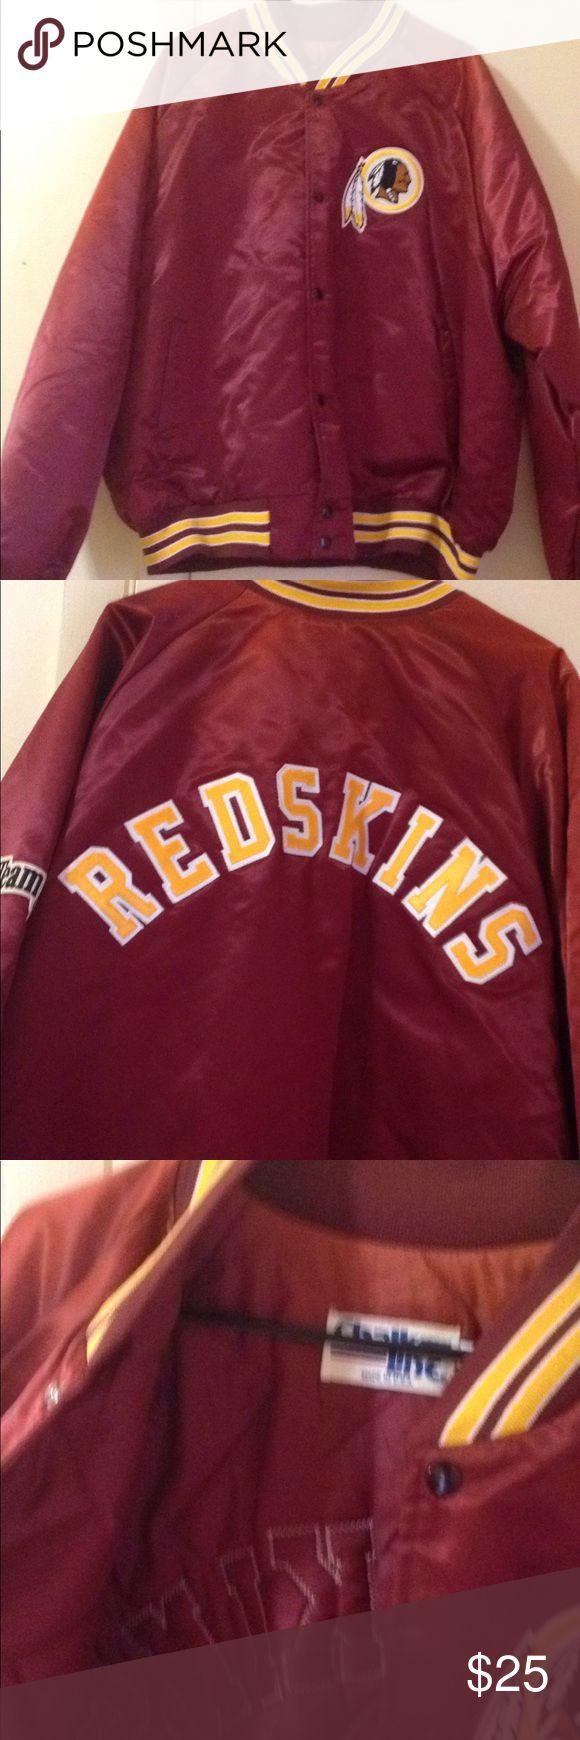 Redskins jacket 3XL Redskins jacket in good condition. Mens 3xl chalk line Jackets & Coats Bomber & Varsity